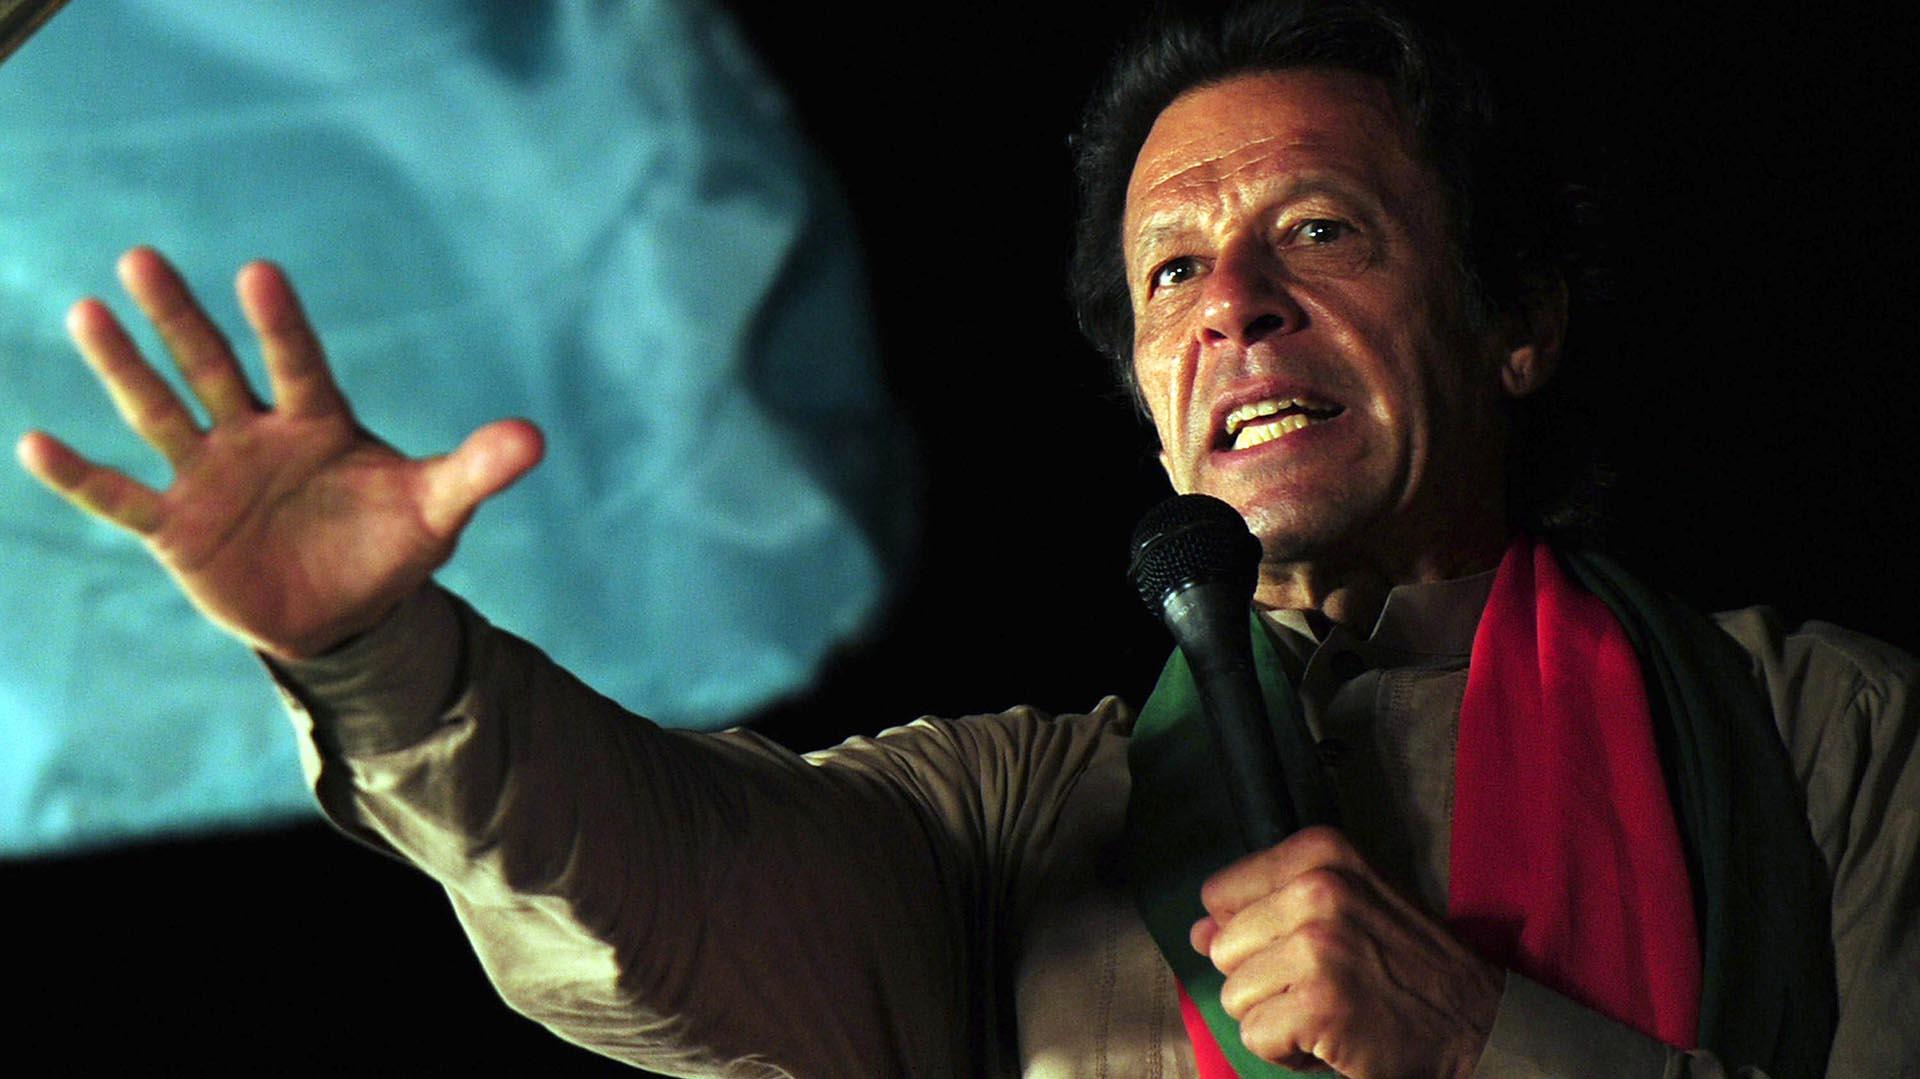 El primer ministro de Pakistán, Imran Khan (AFP/Asif HASSAN)